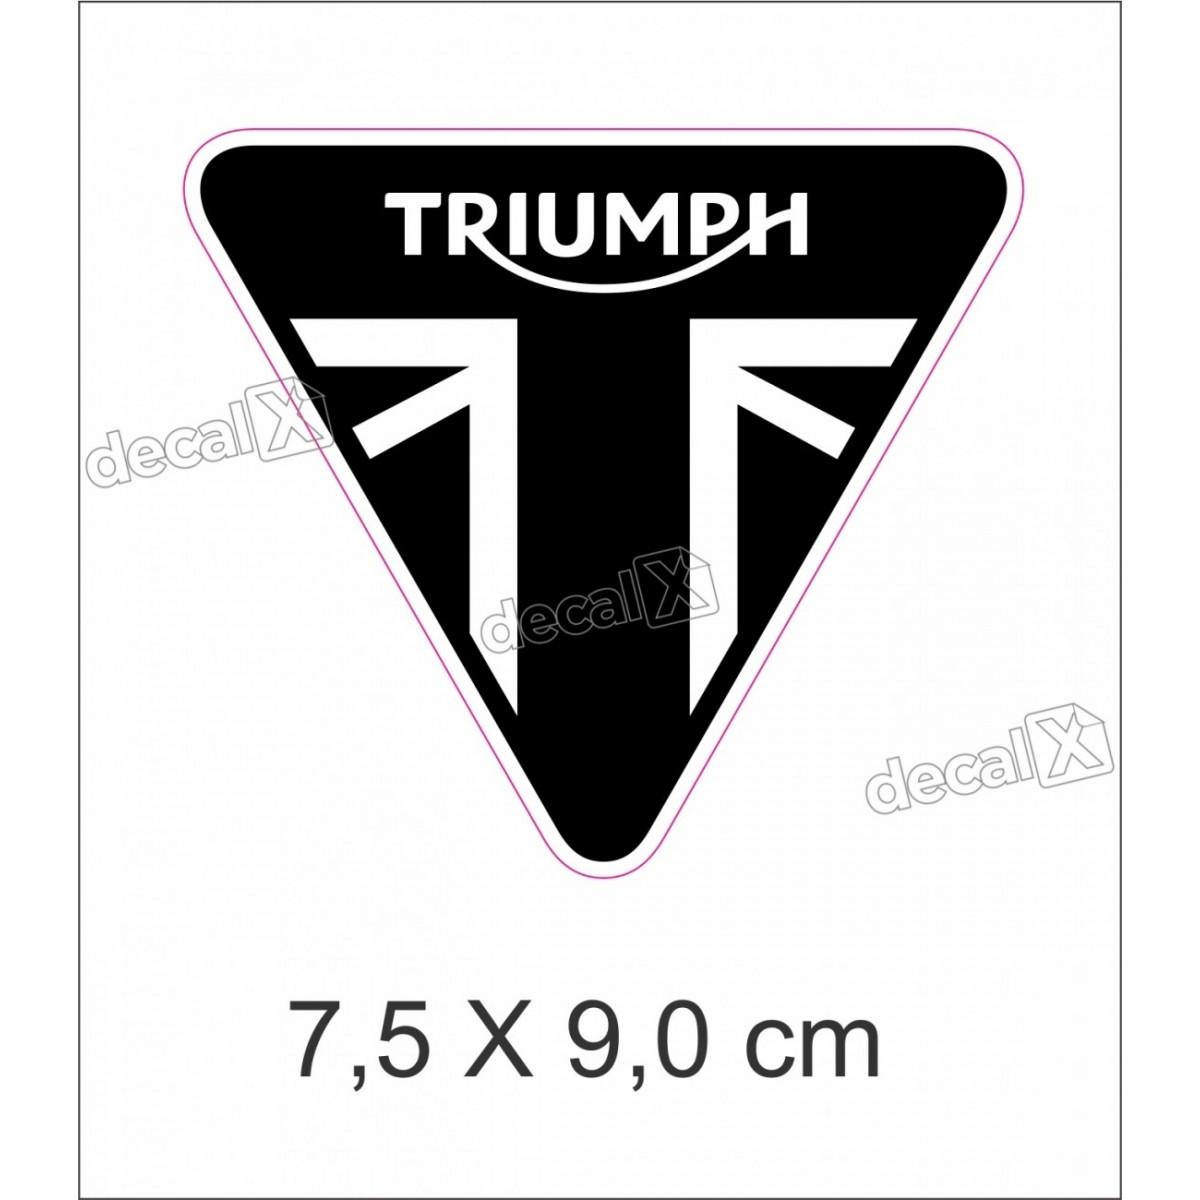 Adesivo Escudo Triumph Resinado 7,5x9,0 Cms Preto 2 Decalx